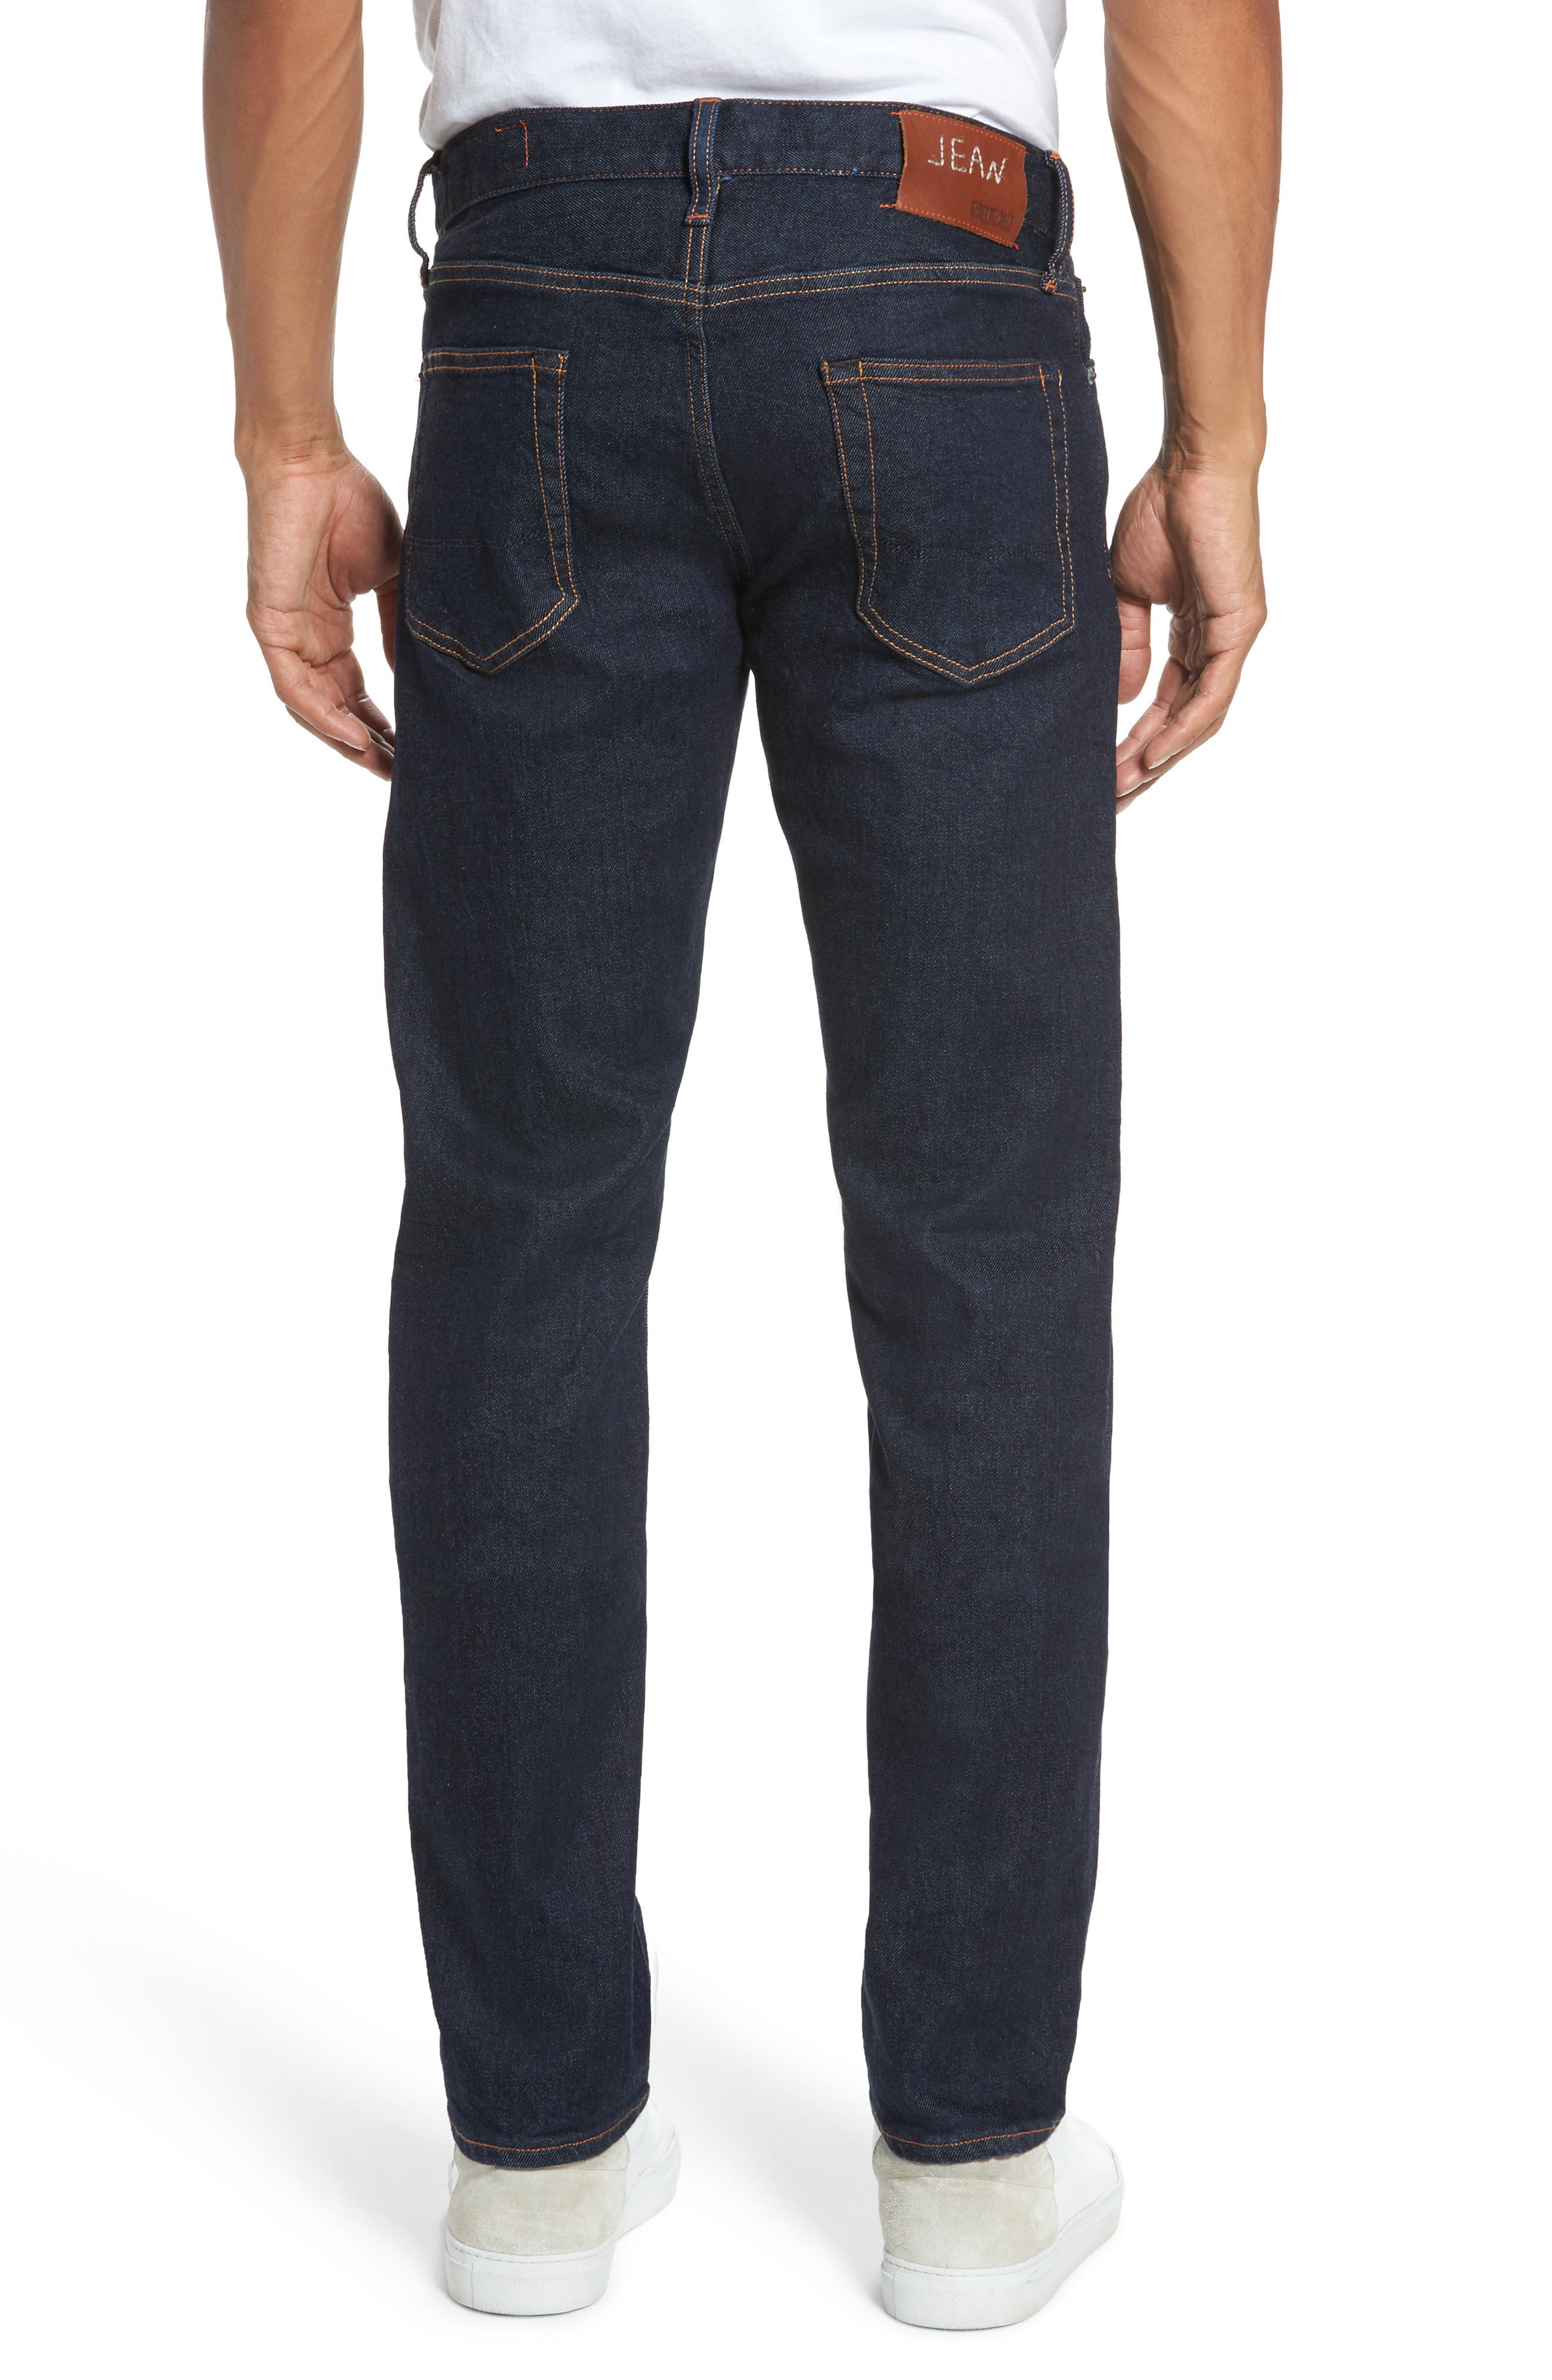 Jim Slim Fit Selvedge Jeans,                             Alternate thumbnail 2, color,                             460